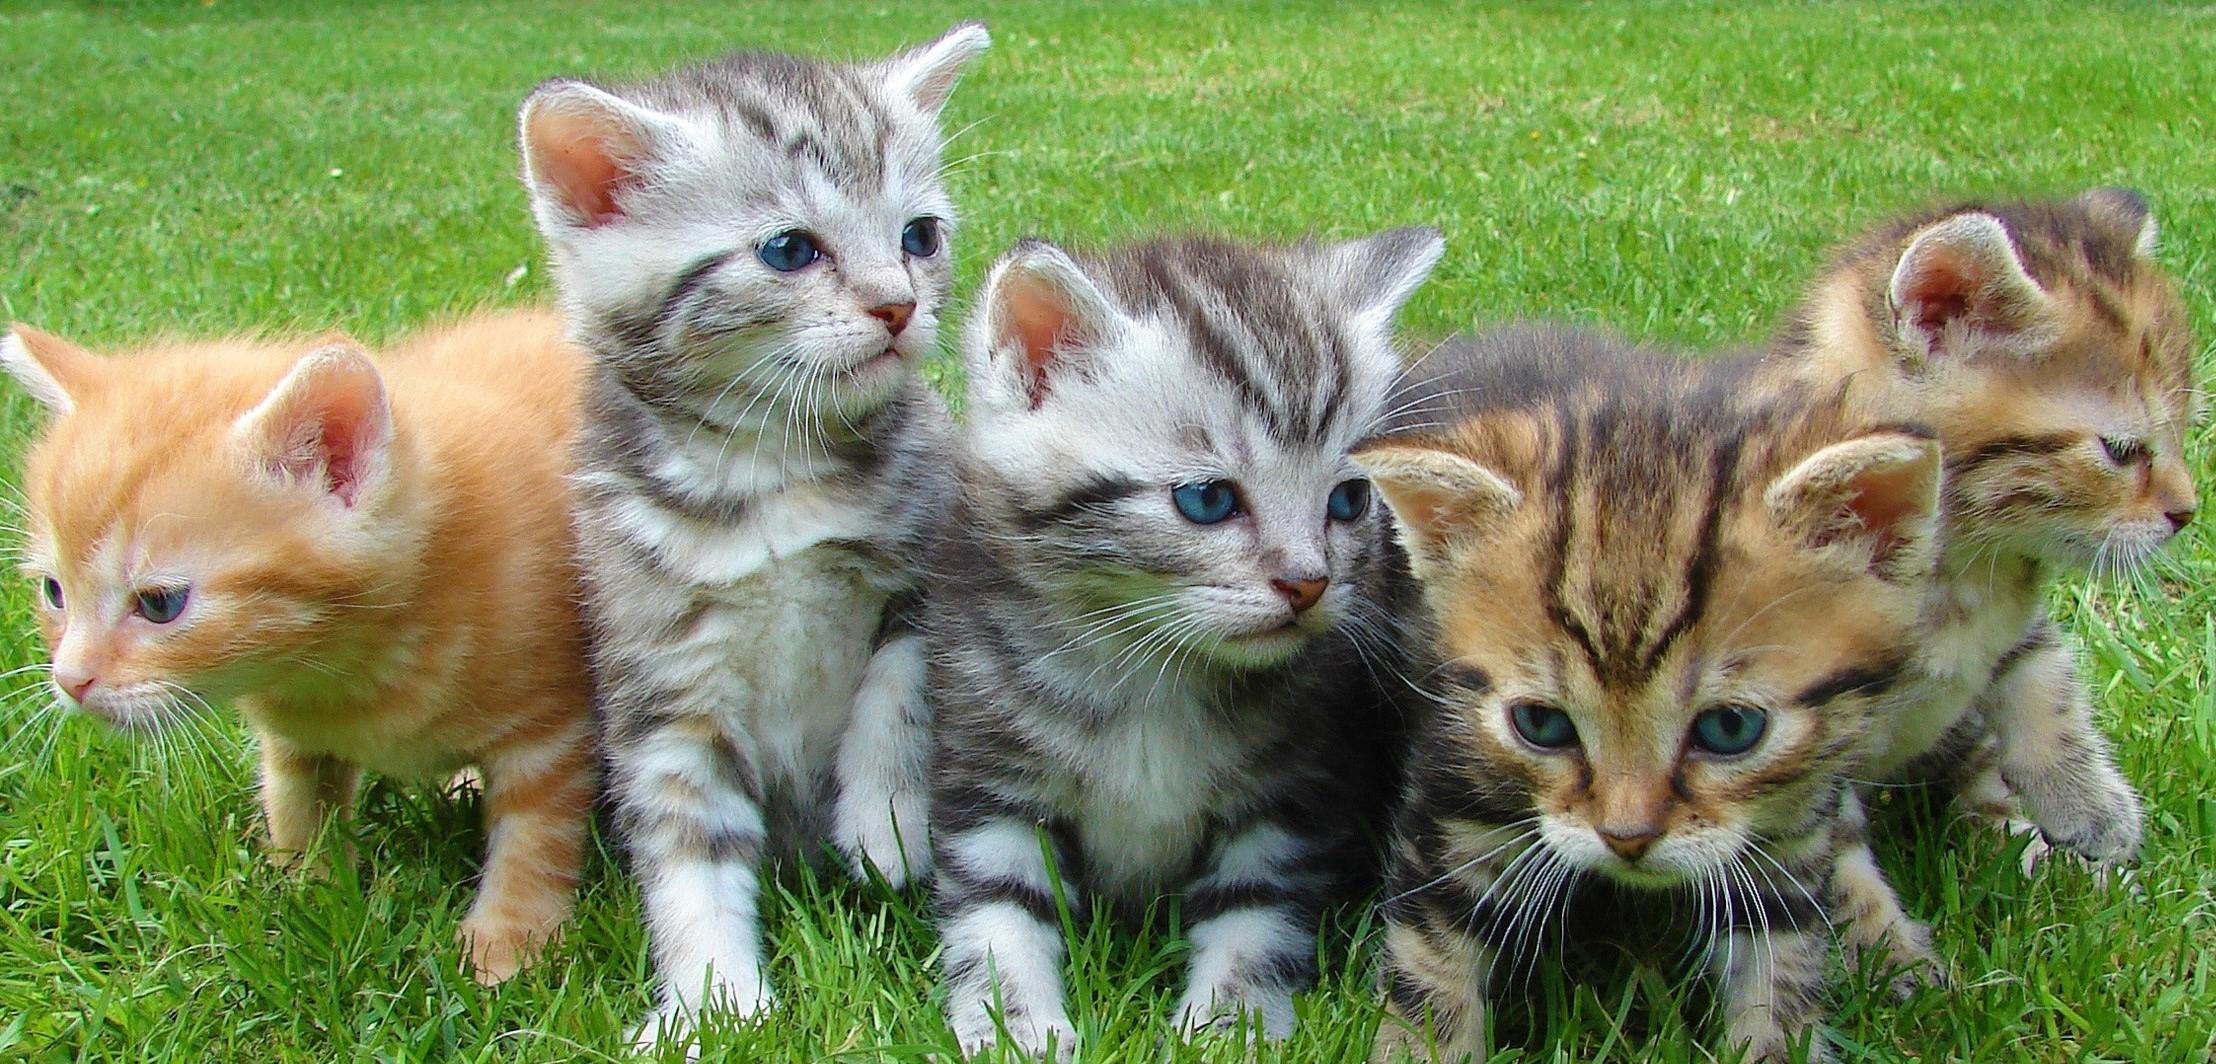 Kittens Cropped.jpg